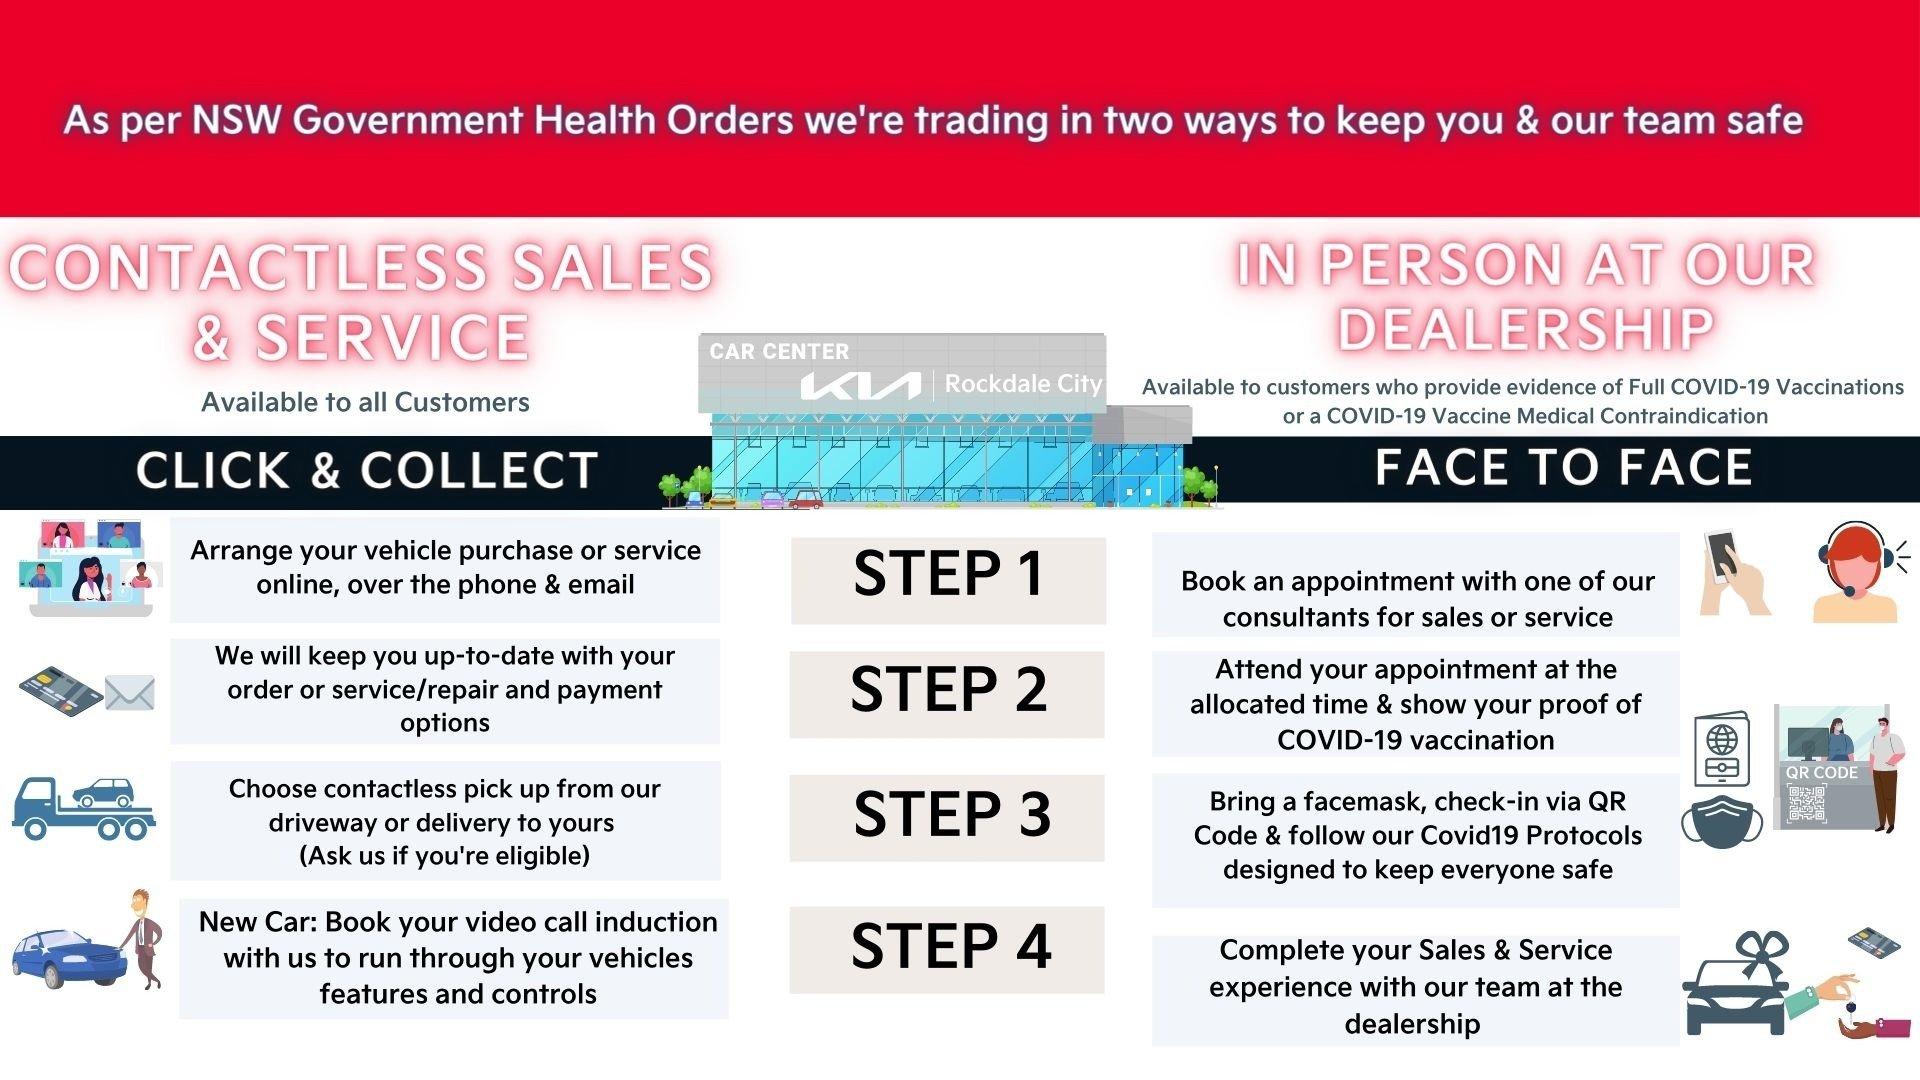 Covid19 Roadmap for Dealership